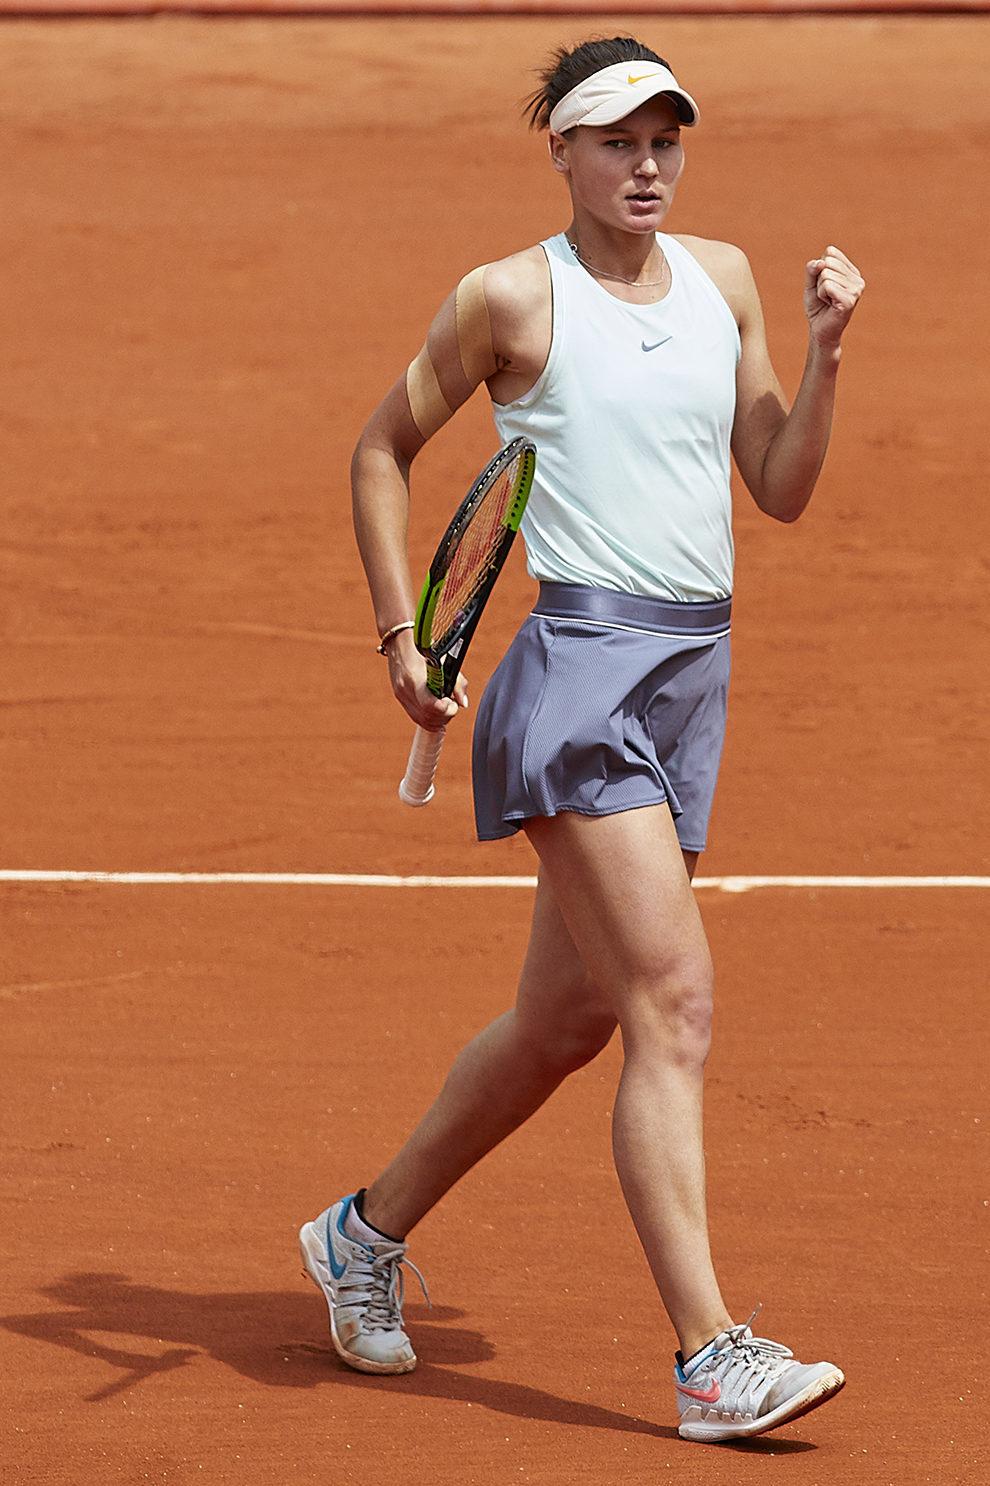 Вероника Кудерметова в Nike